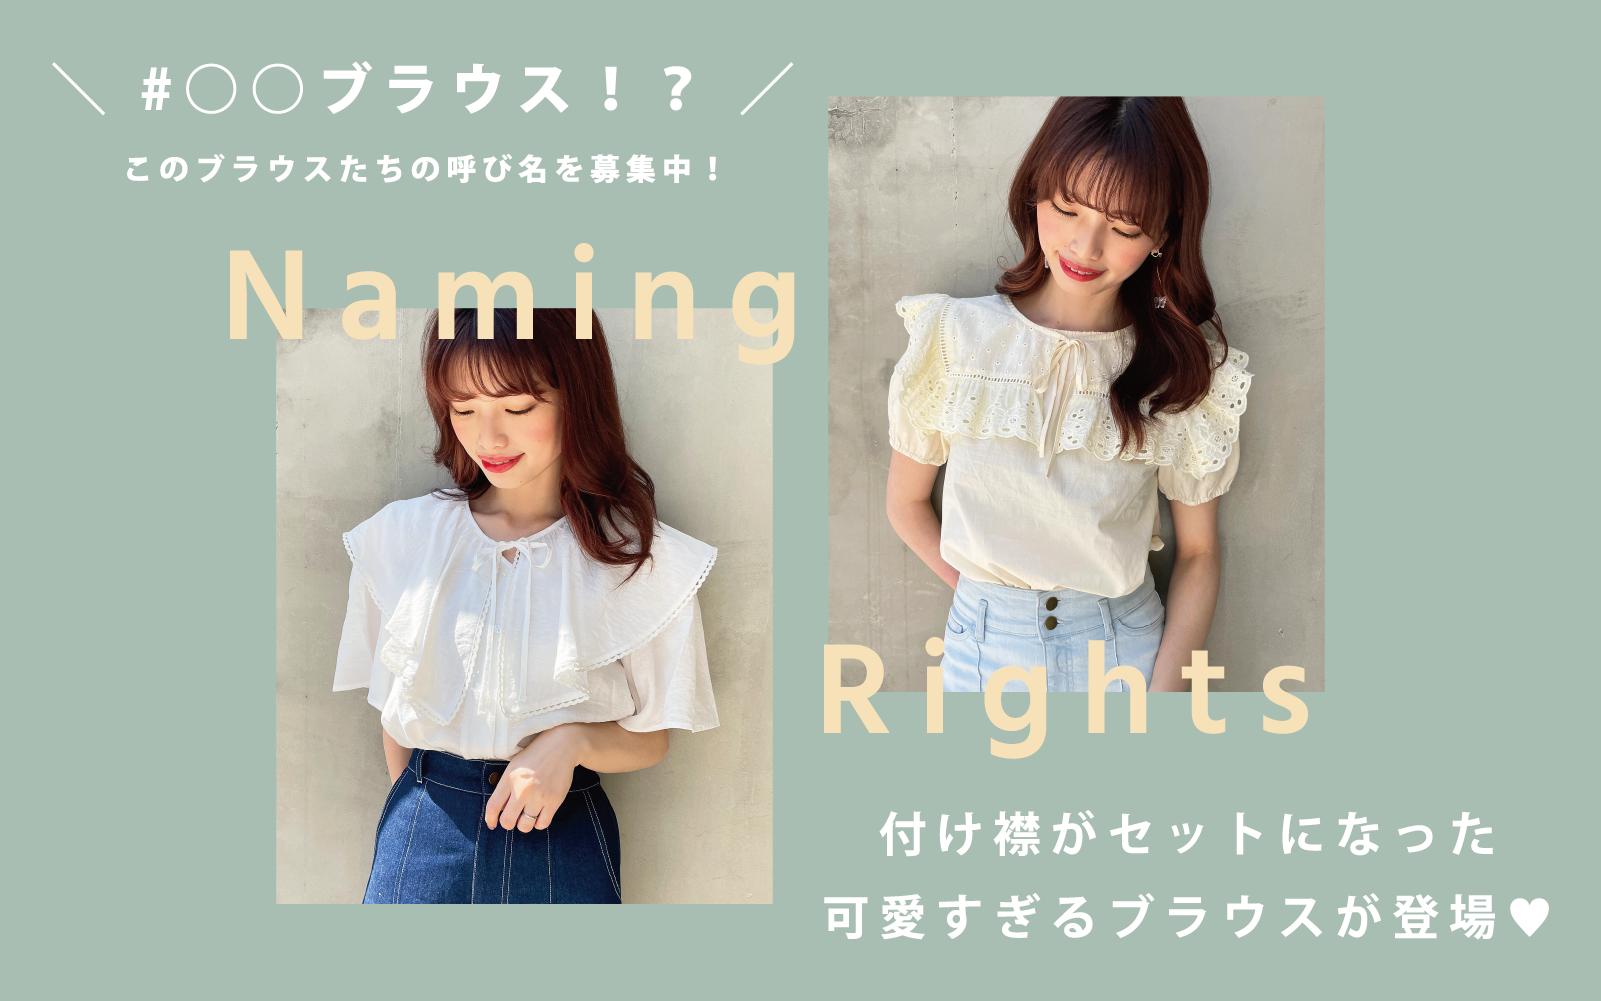 \ Naming Rights /呼び名募集中!マジェいちおしブラウス❤